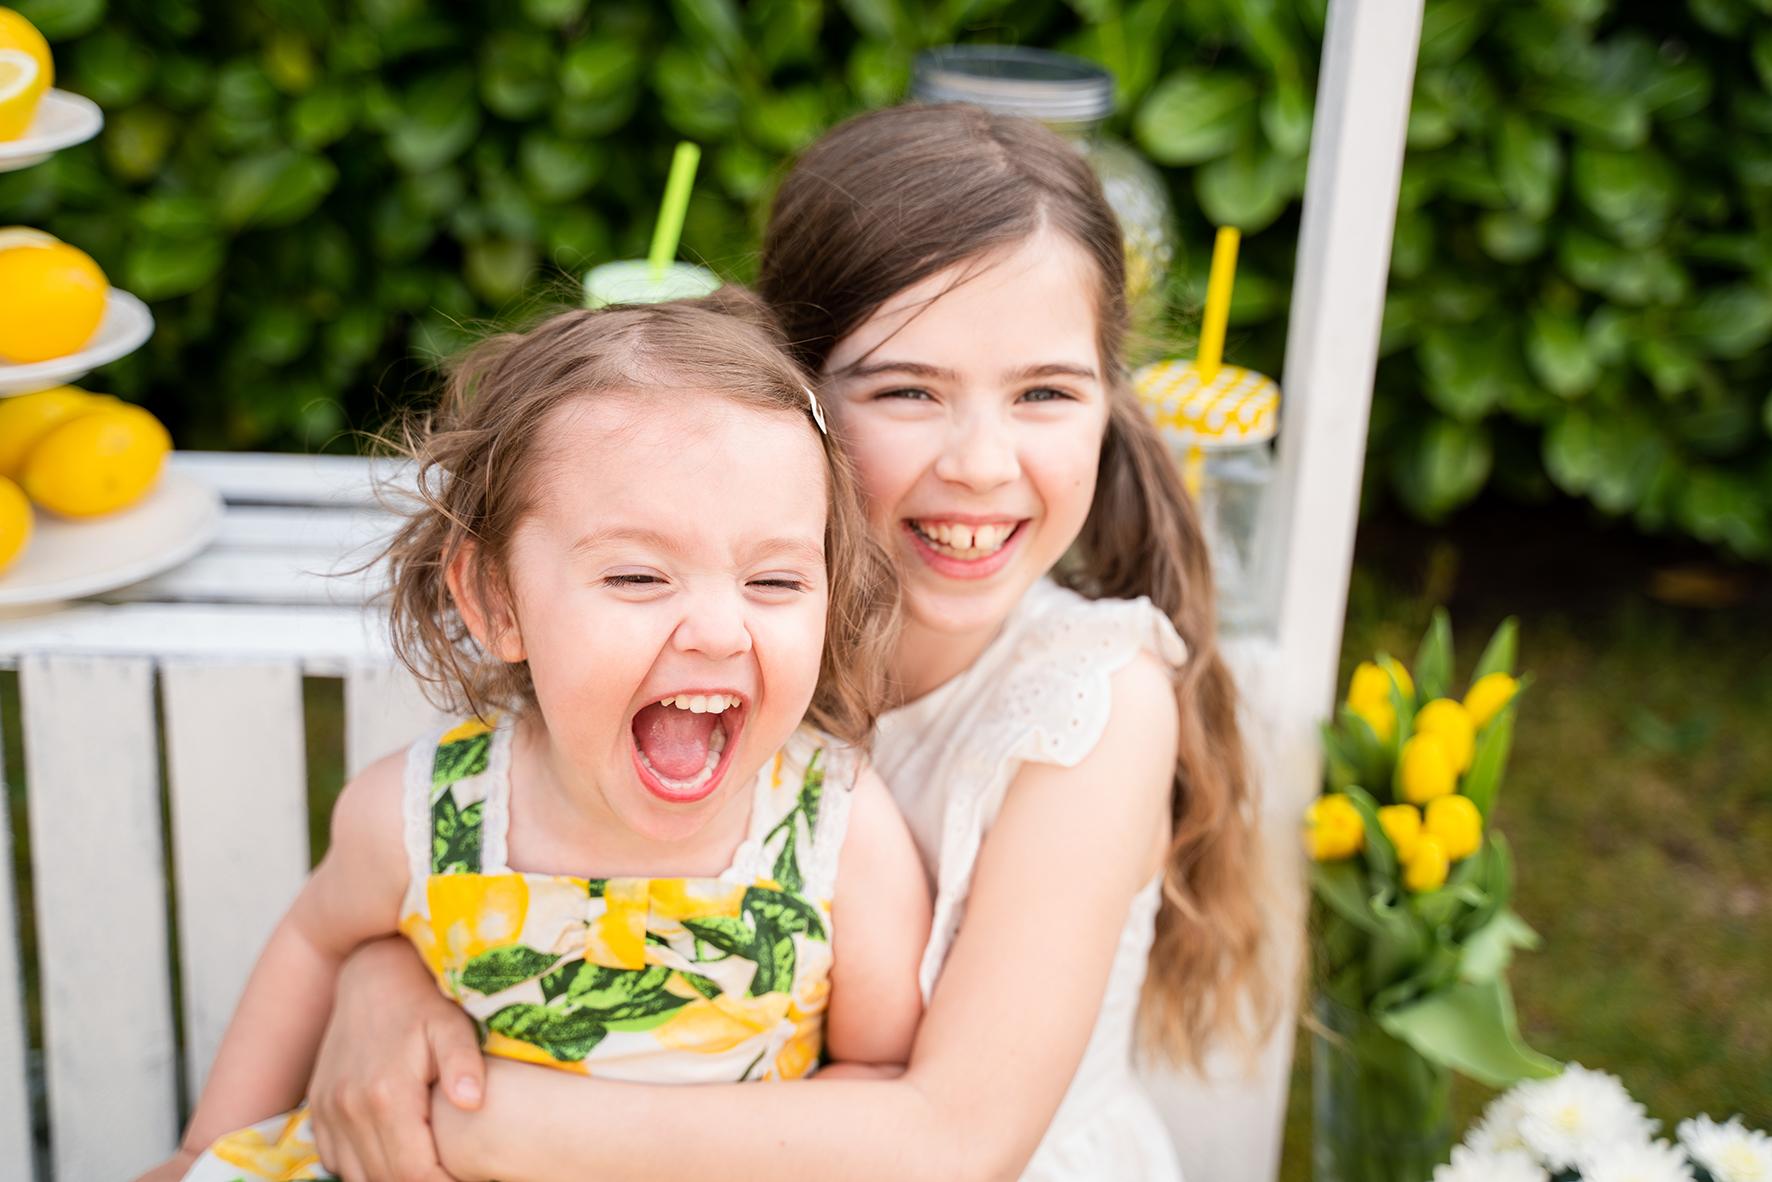 Fotoshooting Geschwisterfotos Familienfotograf Bremen Kinderfotoshooting